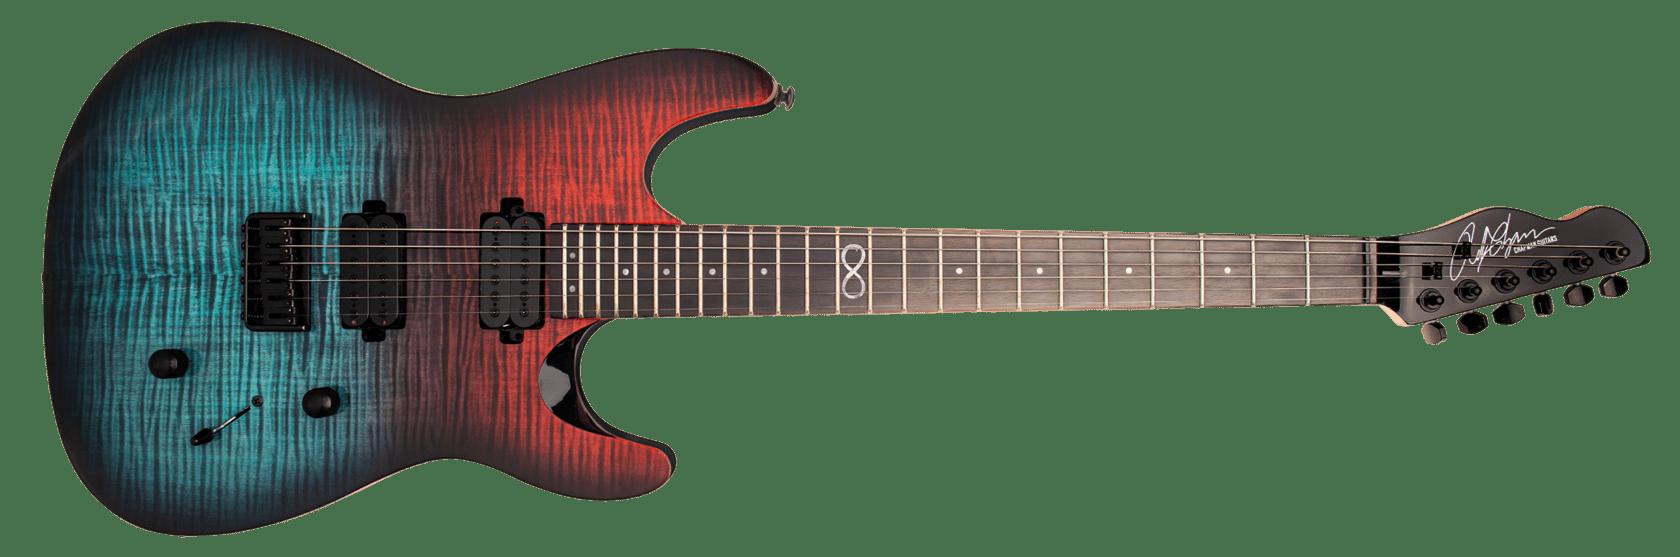 ml1 mod guitar front